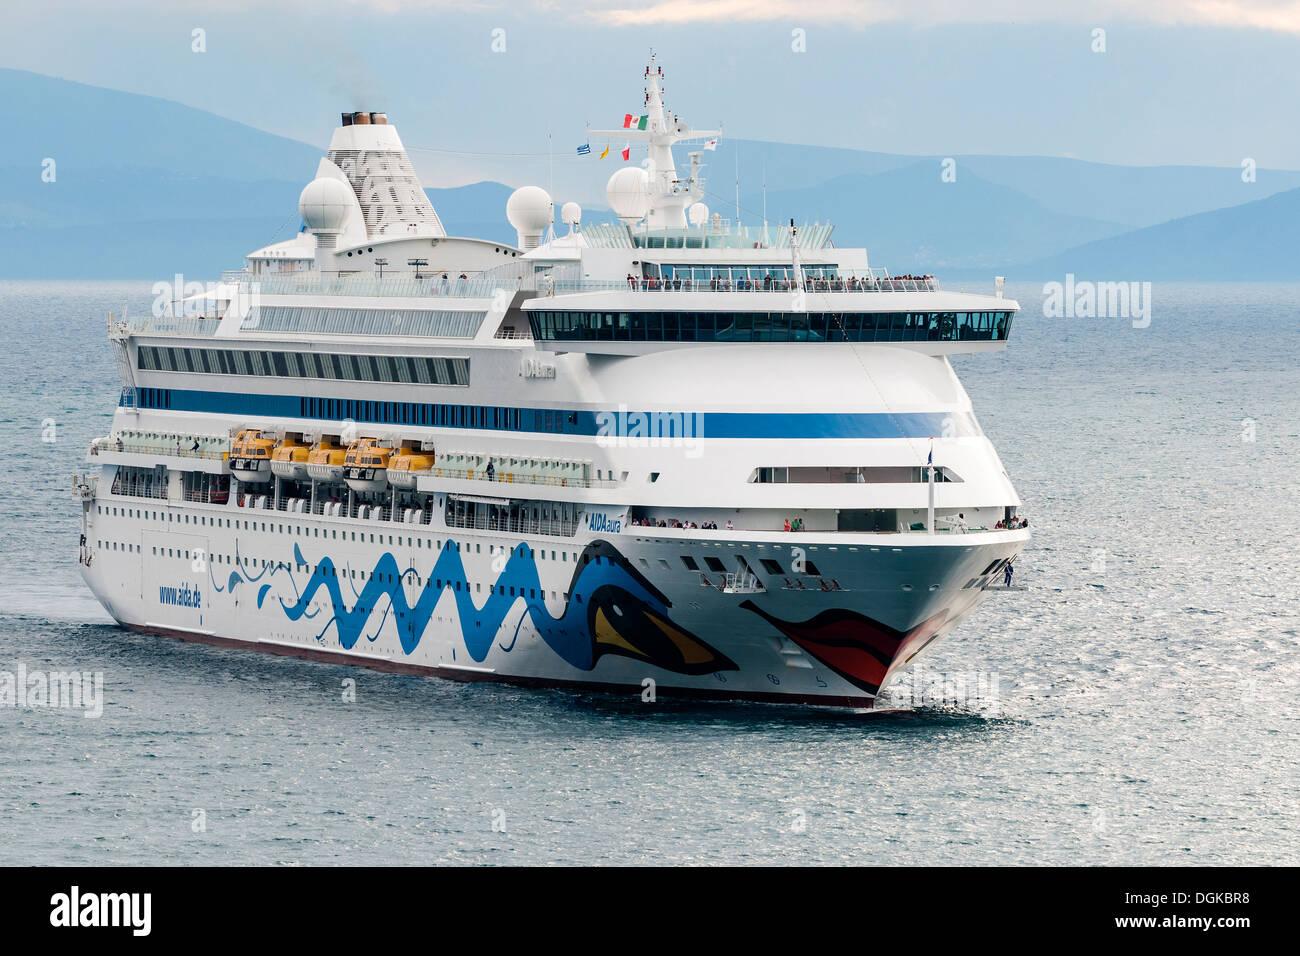 AIDAaura cruise ship. Cruising the Mediterranean Sea, Europe - Stock Image